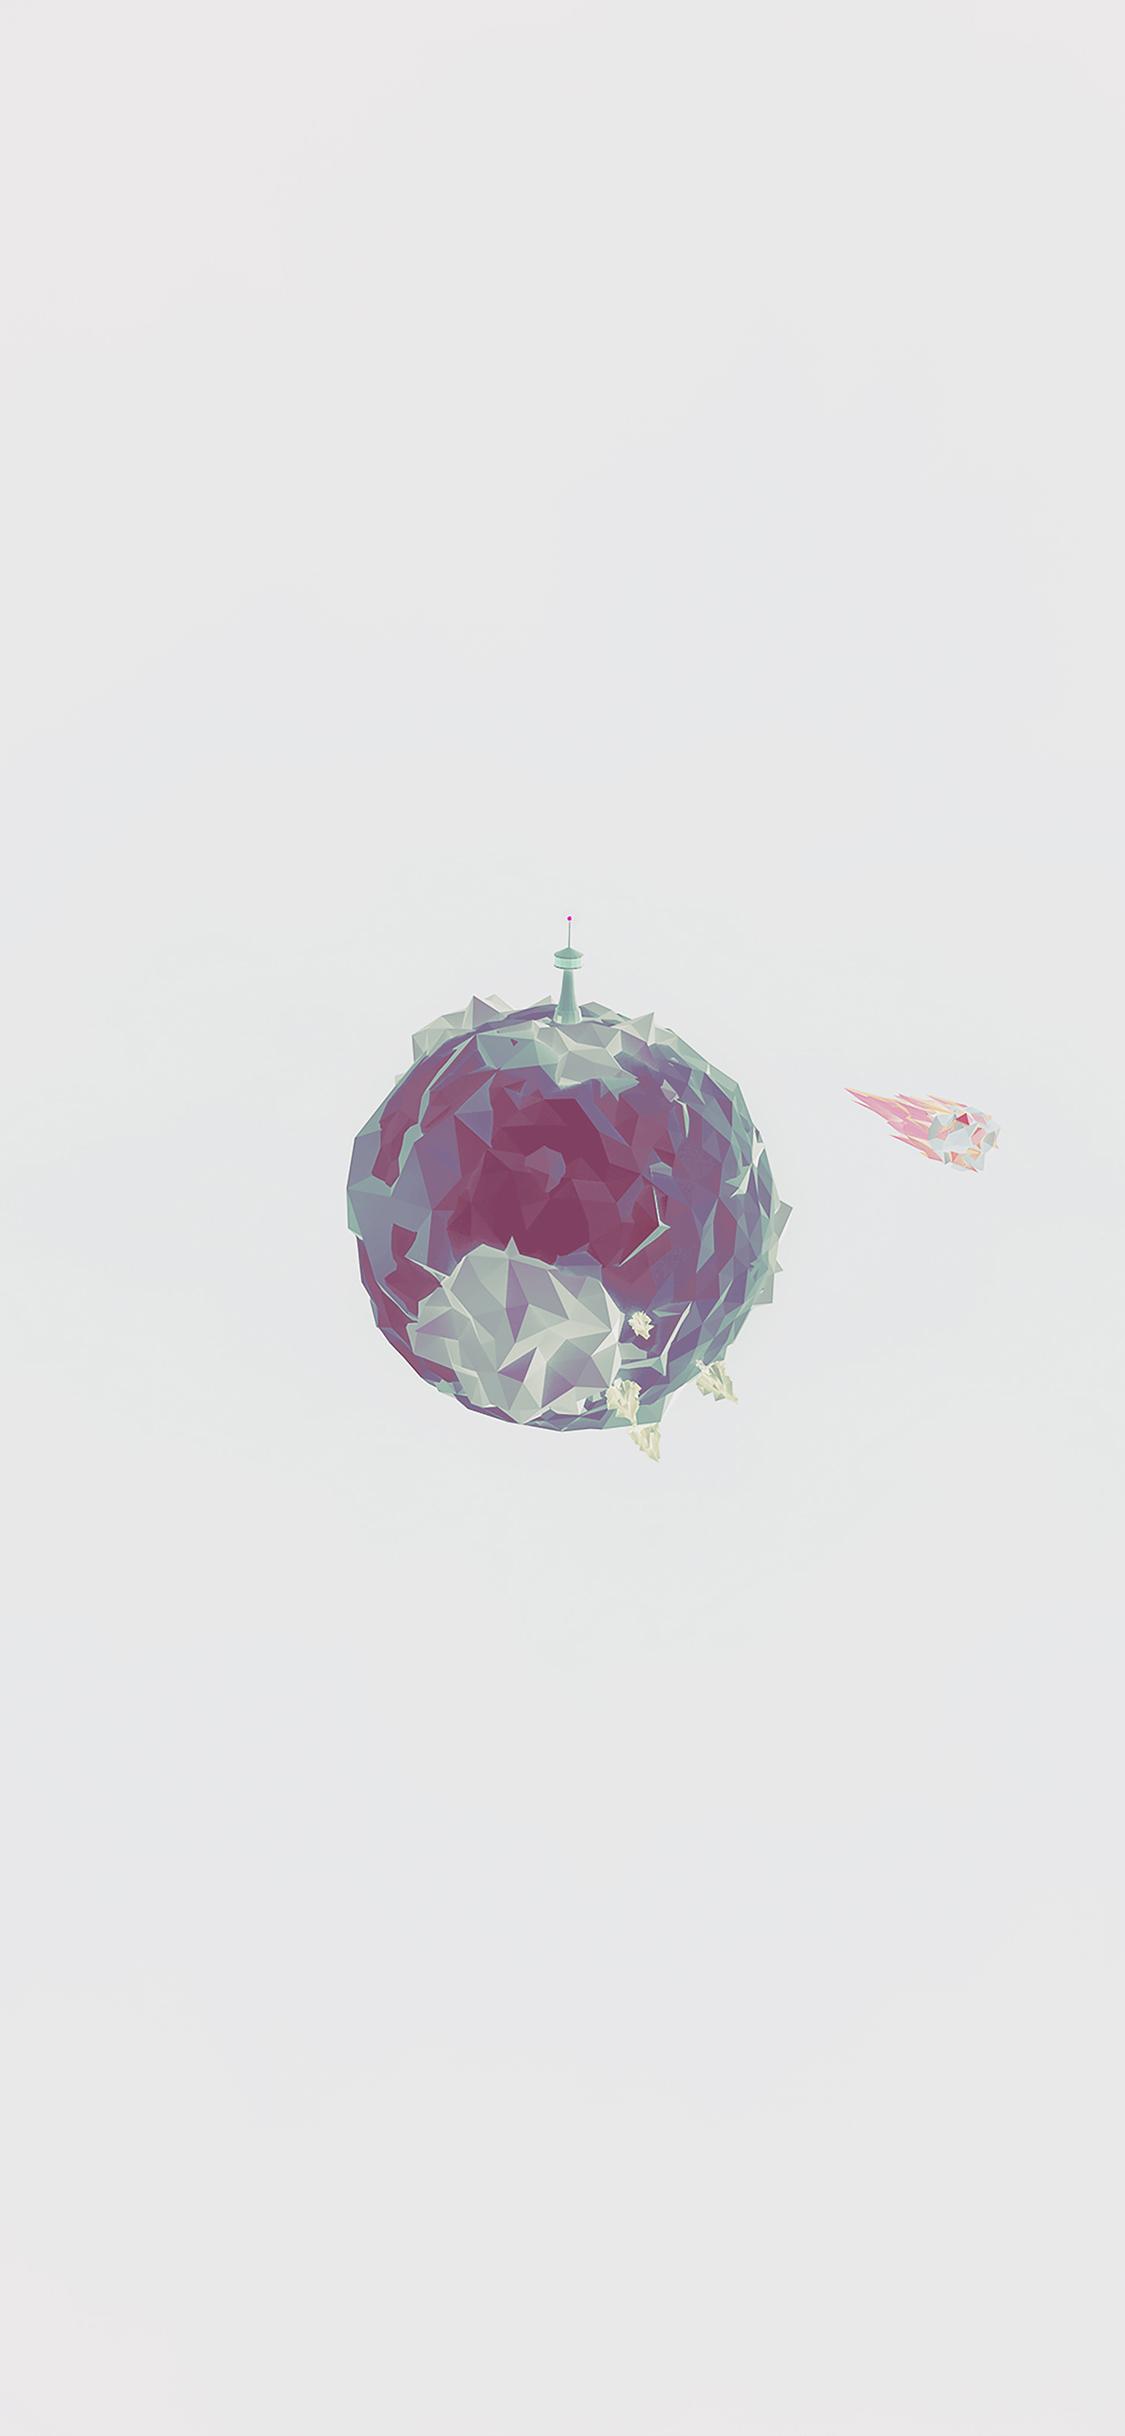 Cute Disney Quotes Wallpapers Aj33 Polygon Planet Cute Minimal Simple Art White Wallpaper